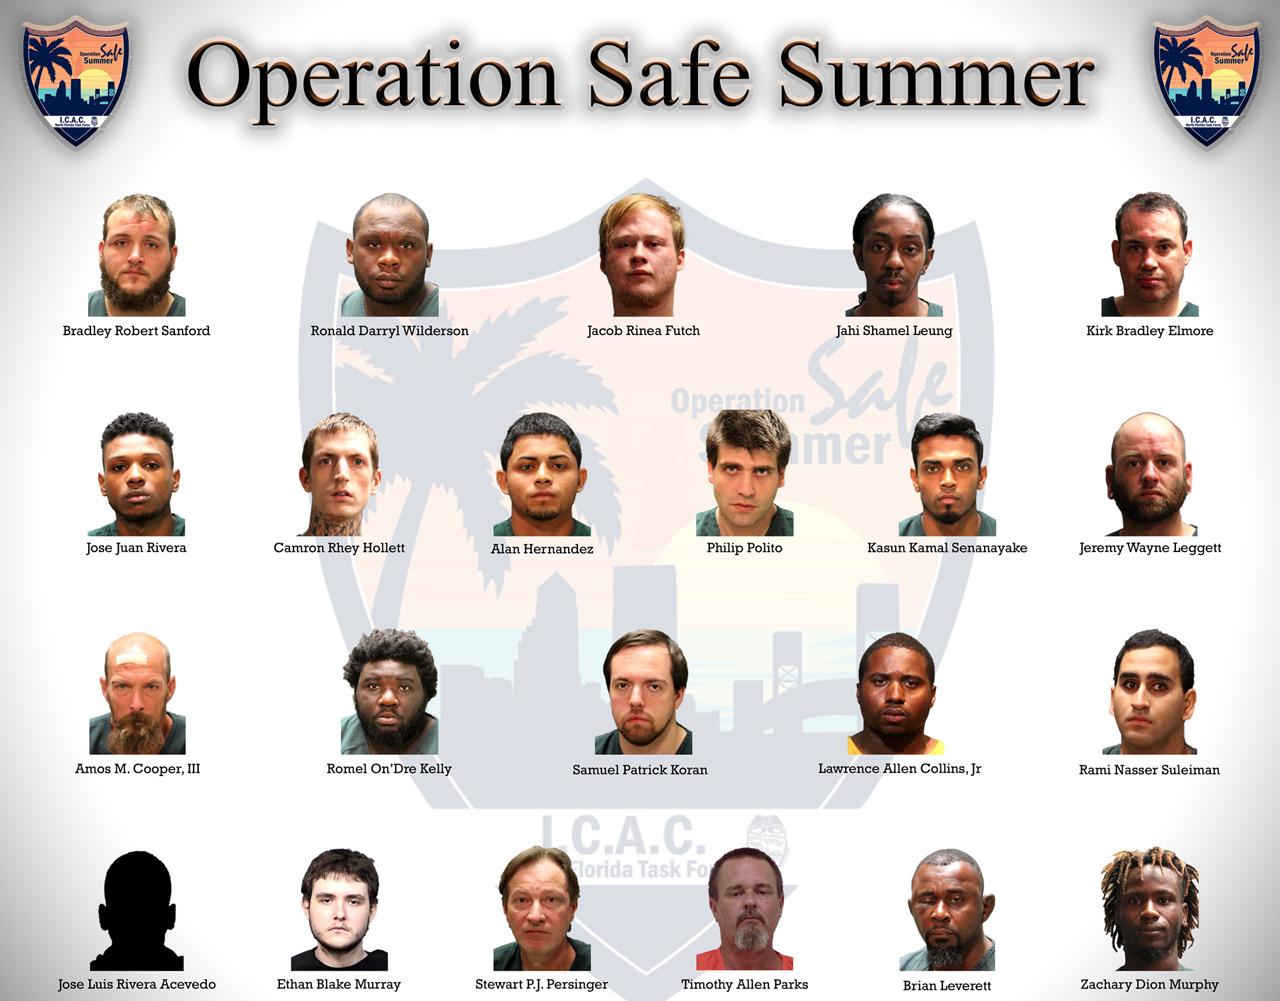 Operaton Safe Summer mugs